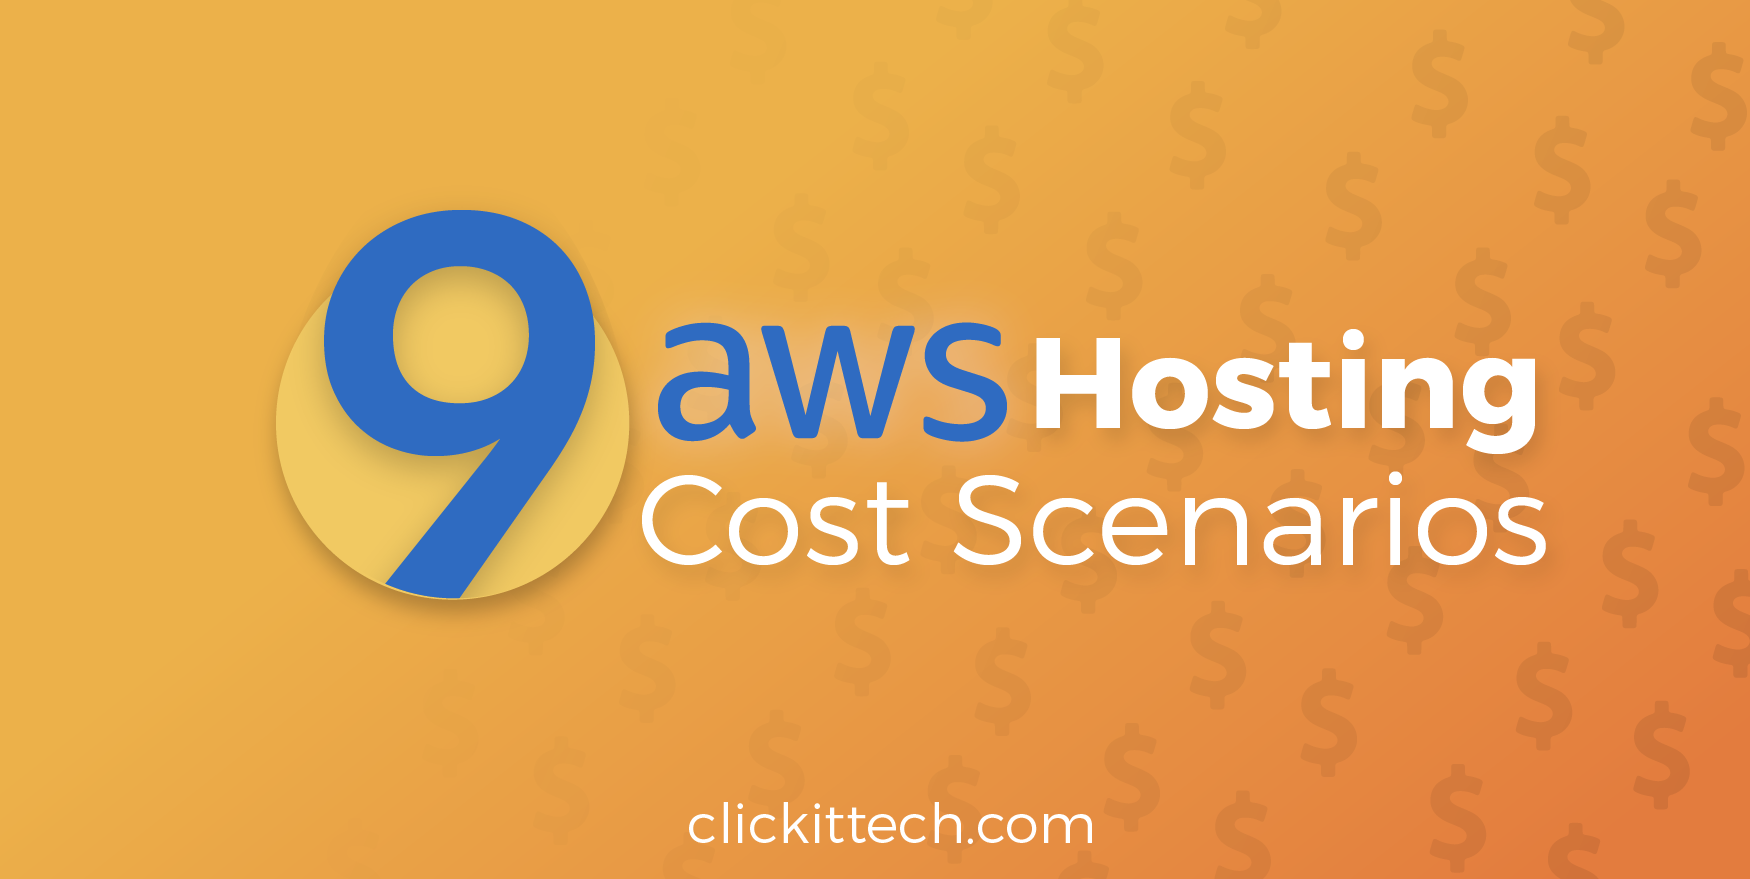 AWS WordPress Hosting Costs - 9 AWS Hosting Cost Scenarios | Clickittech